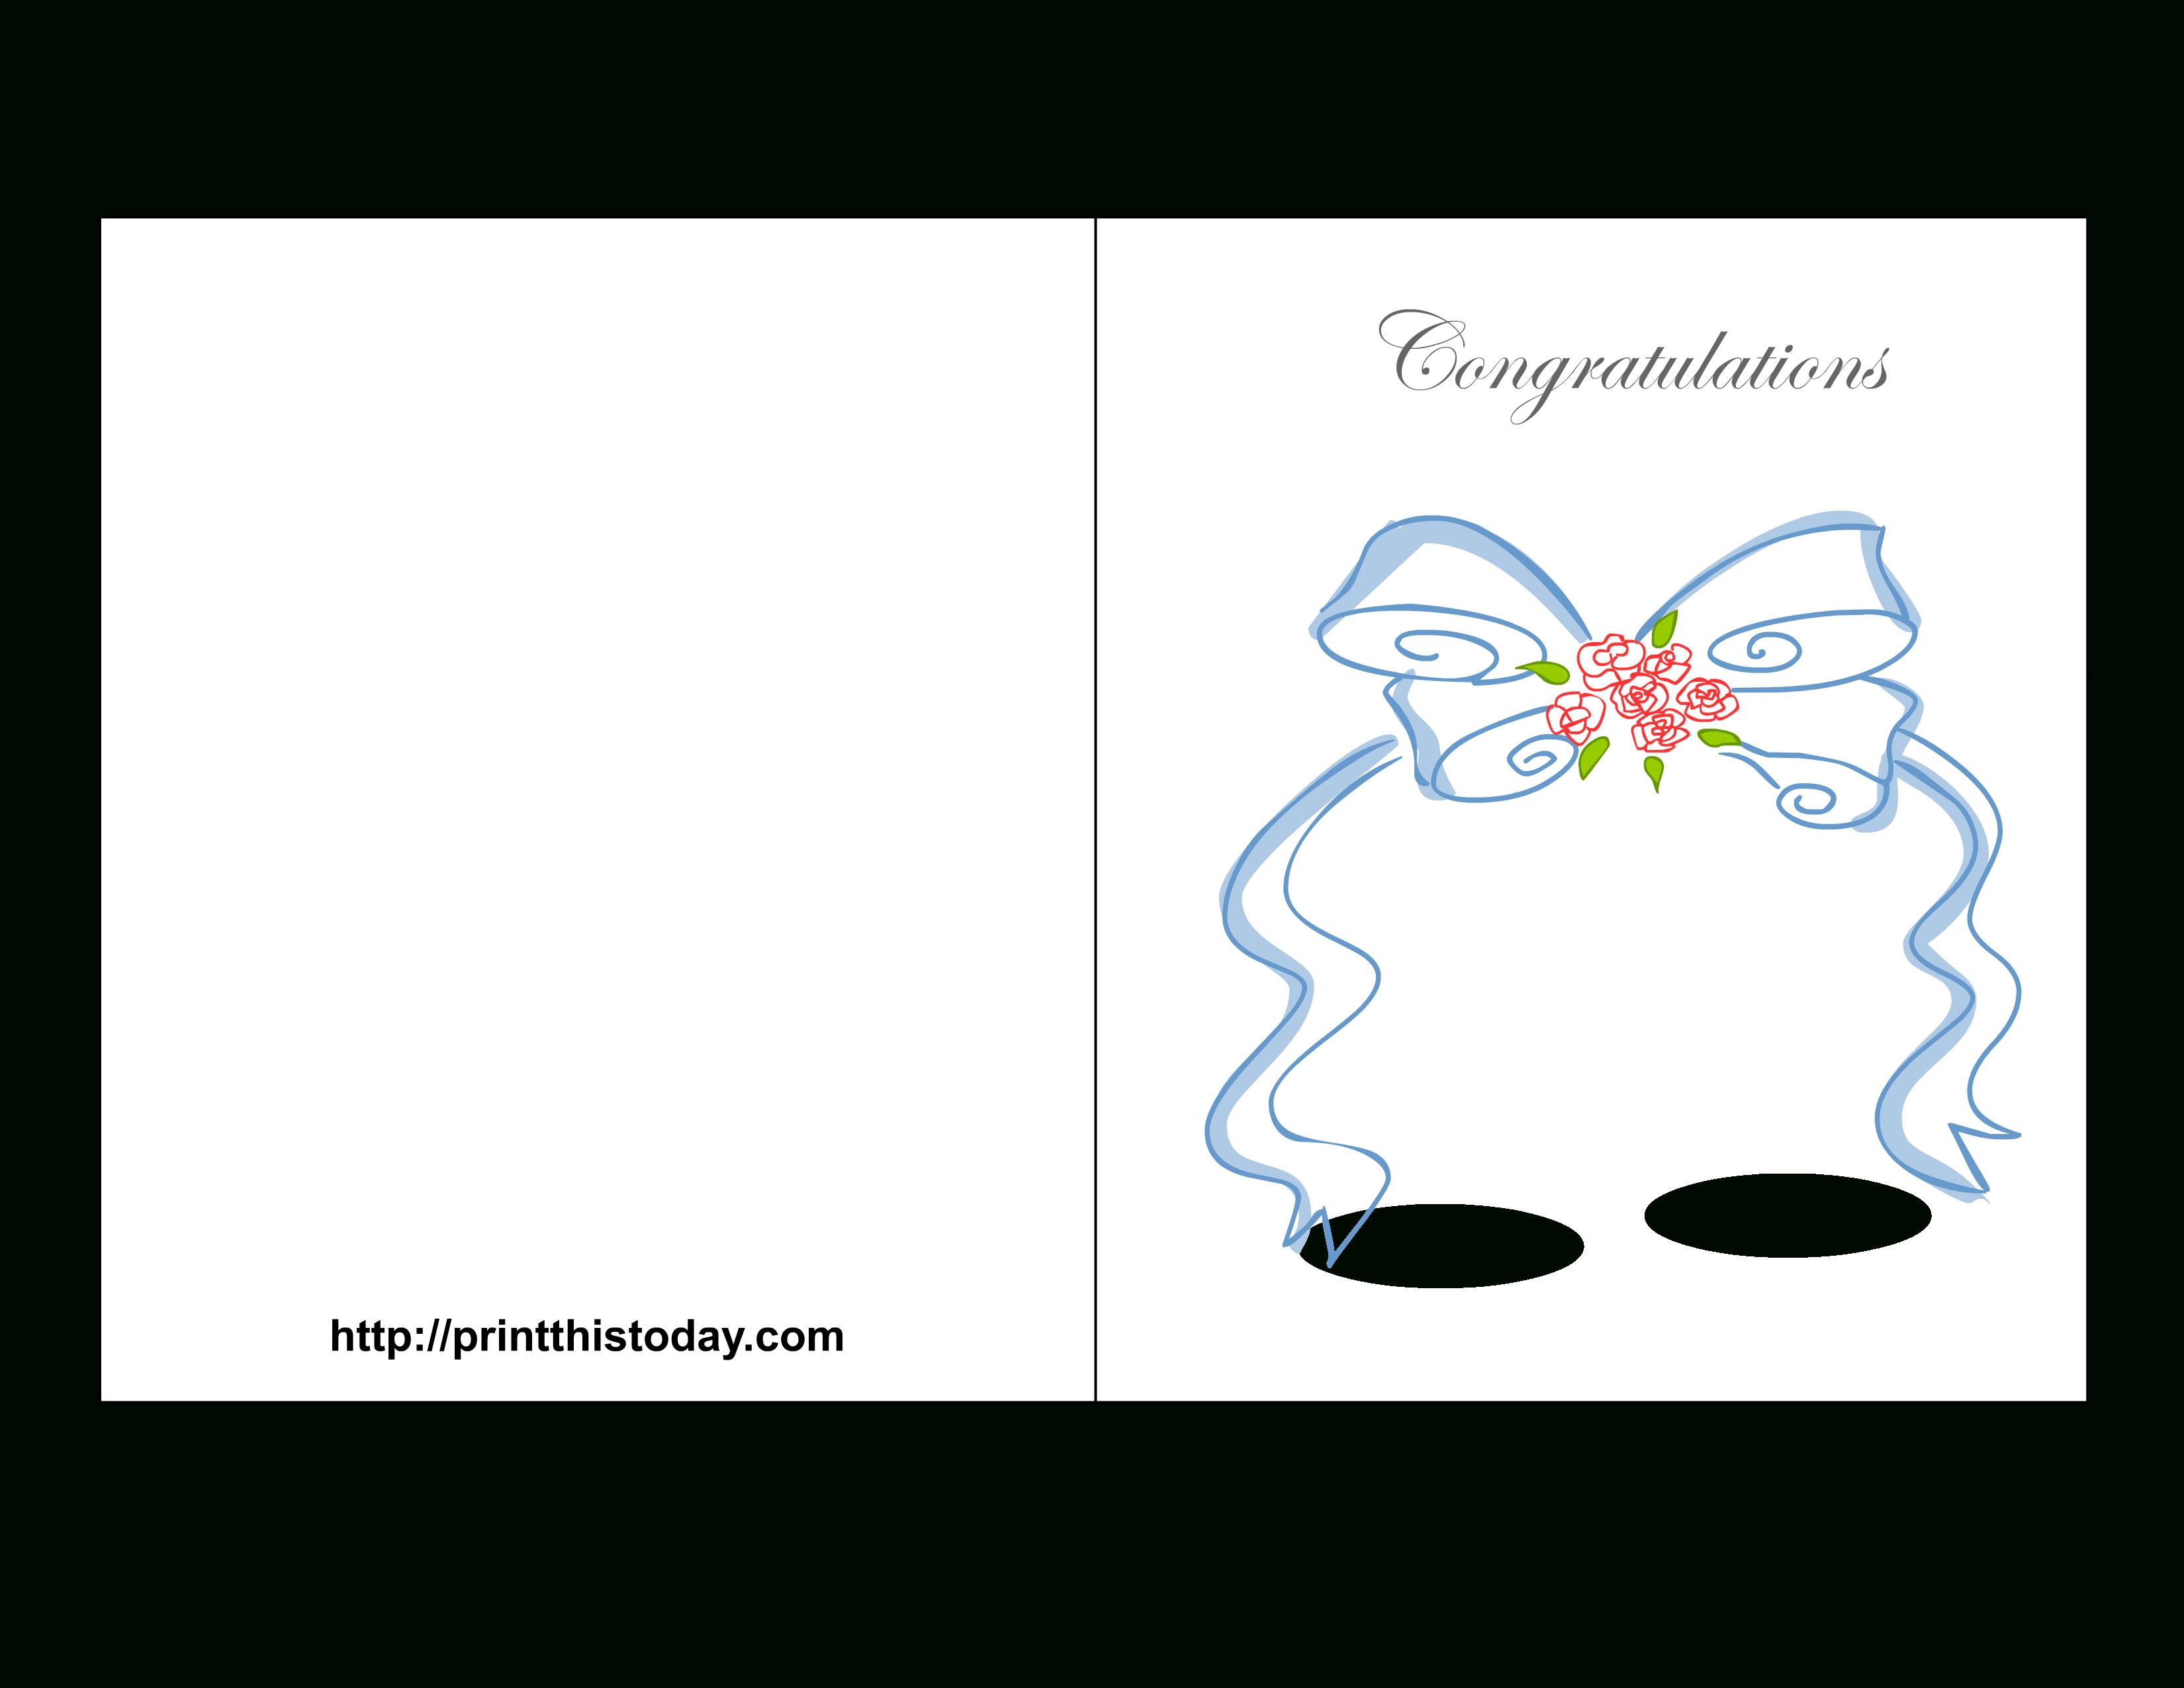 Free Printable Wedding Congratulations Cards - Free Printable Wedding Shower Greeting Cards